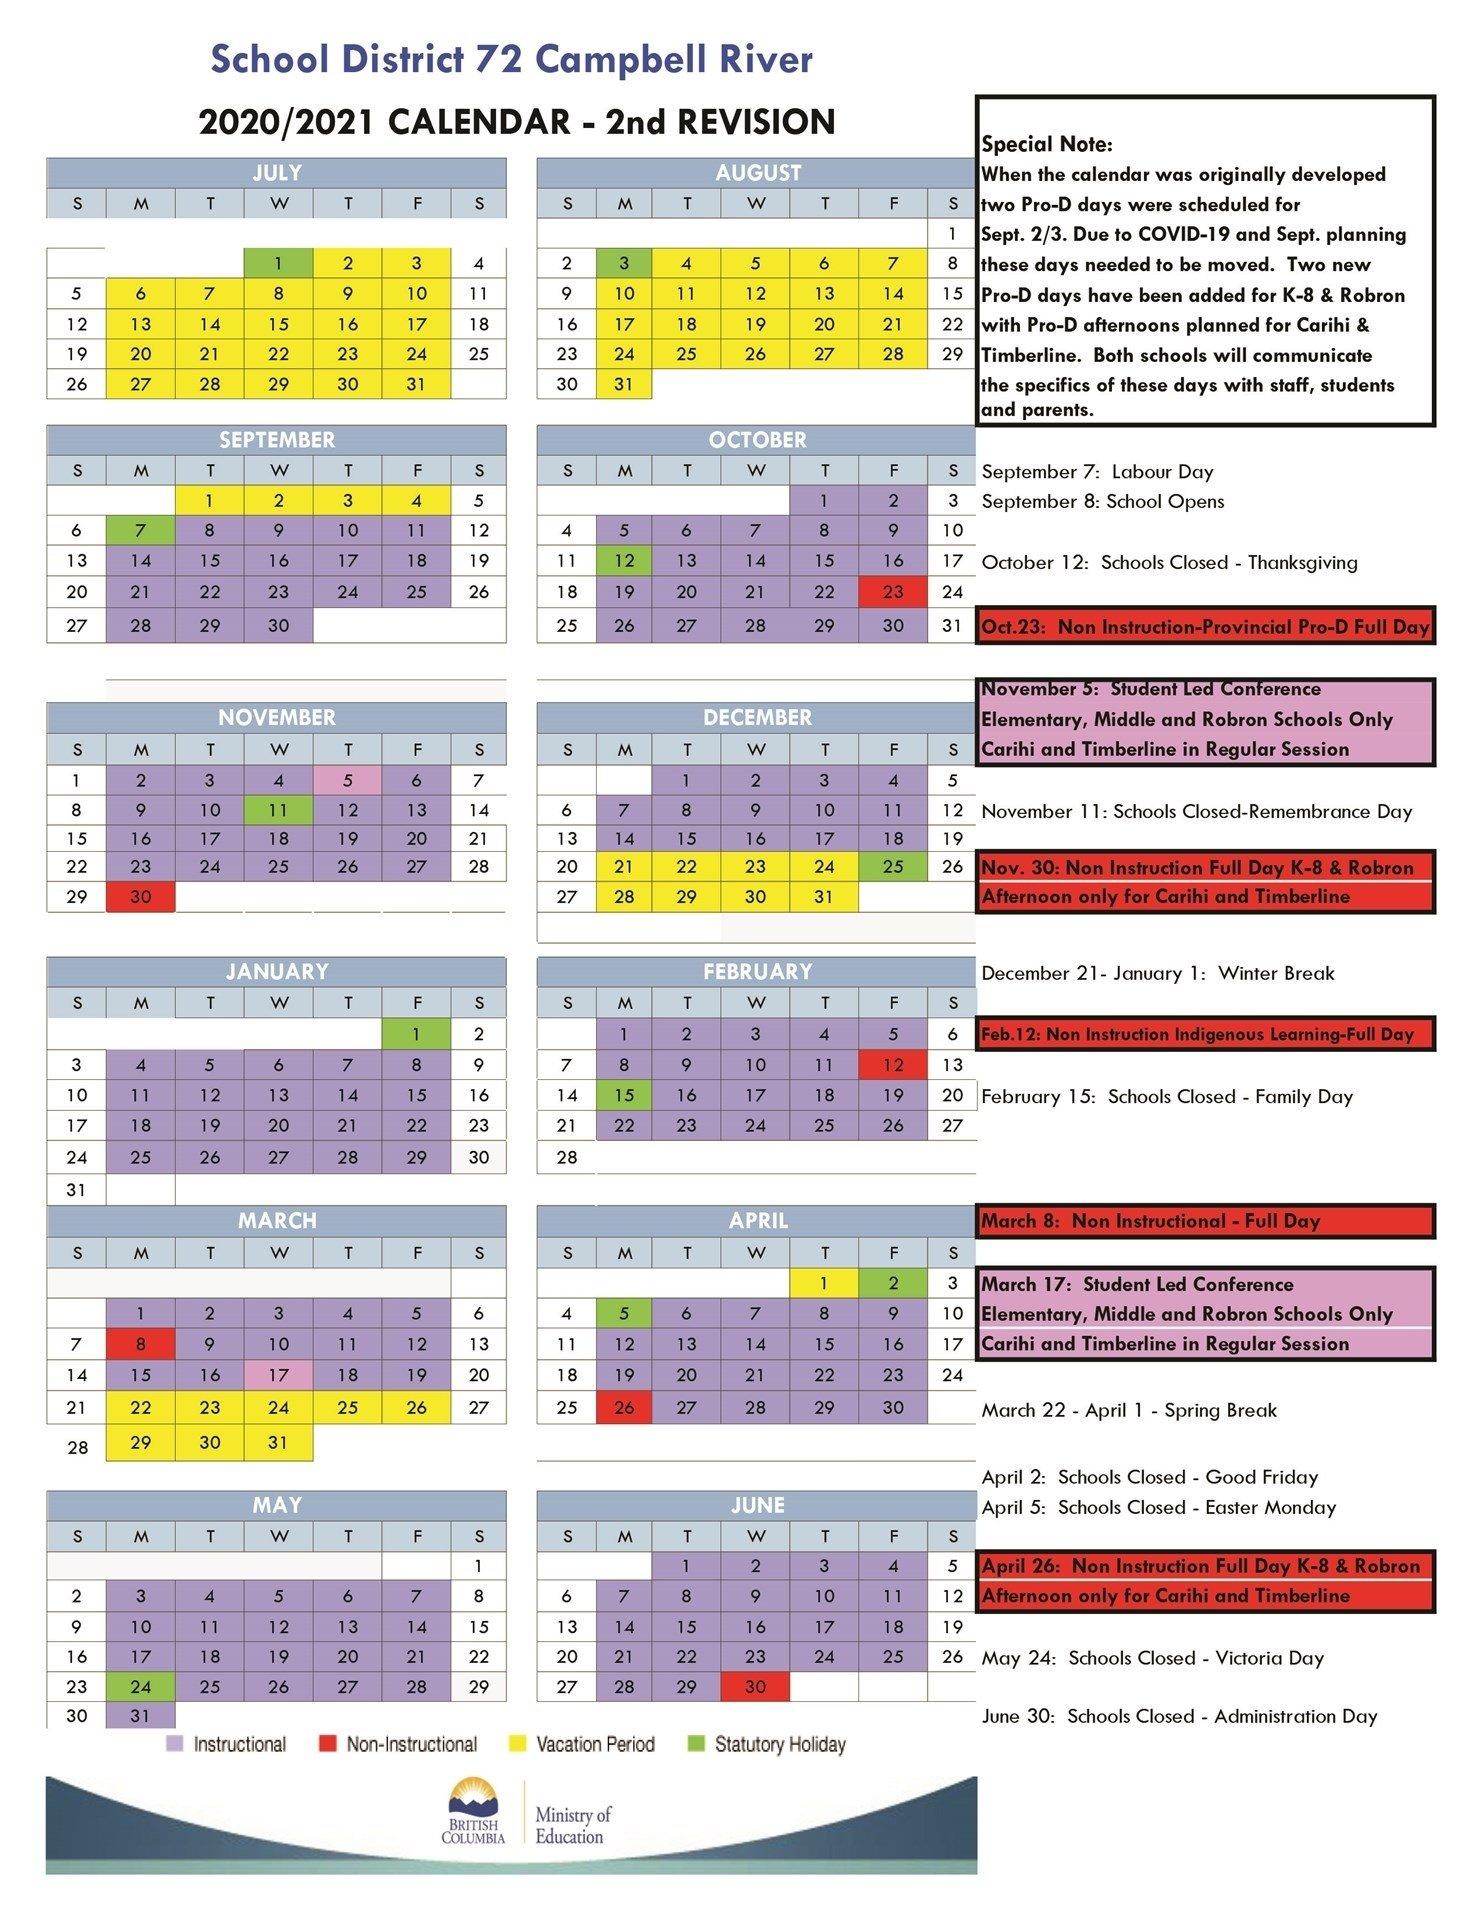 2021-2021 Medication 28 Day Expiration Date Calendar 28 Day Medication Calender